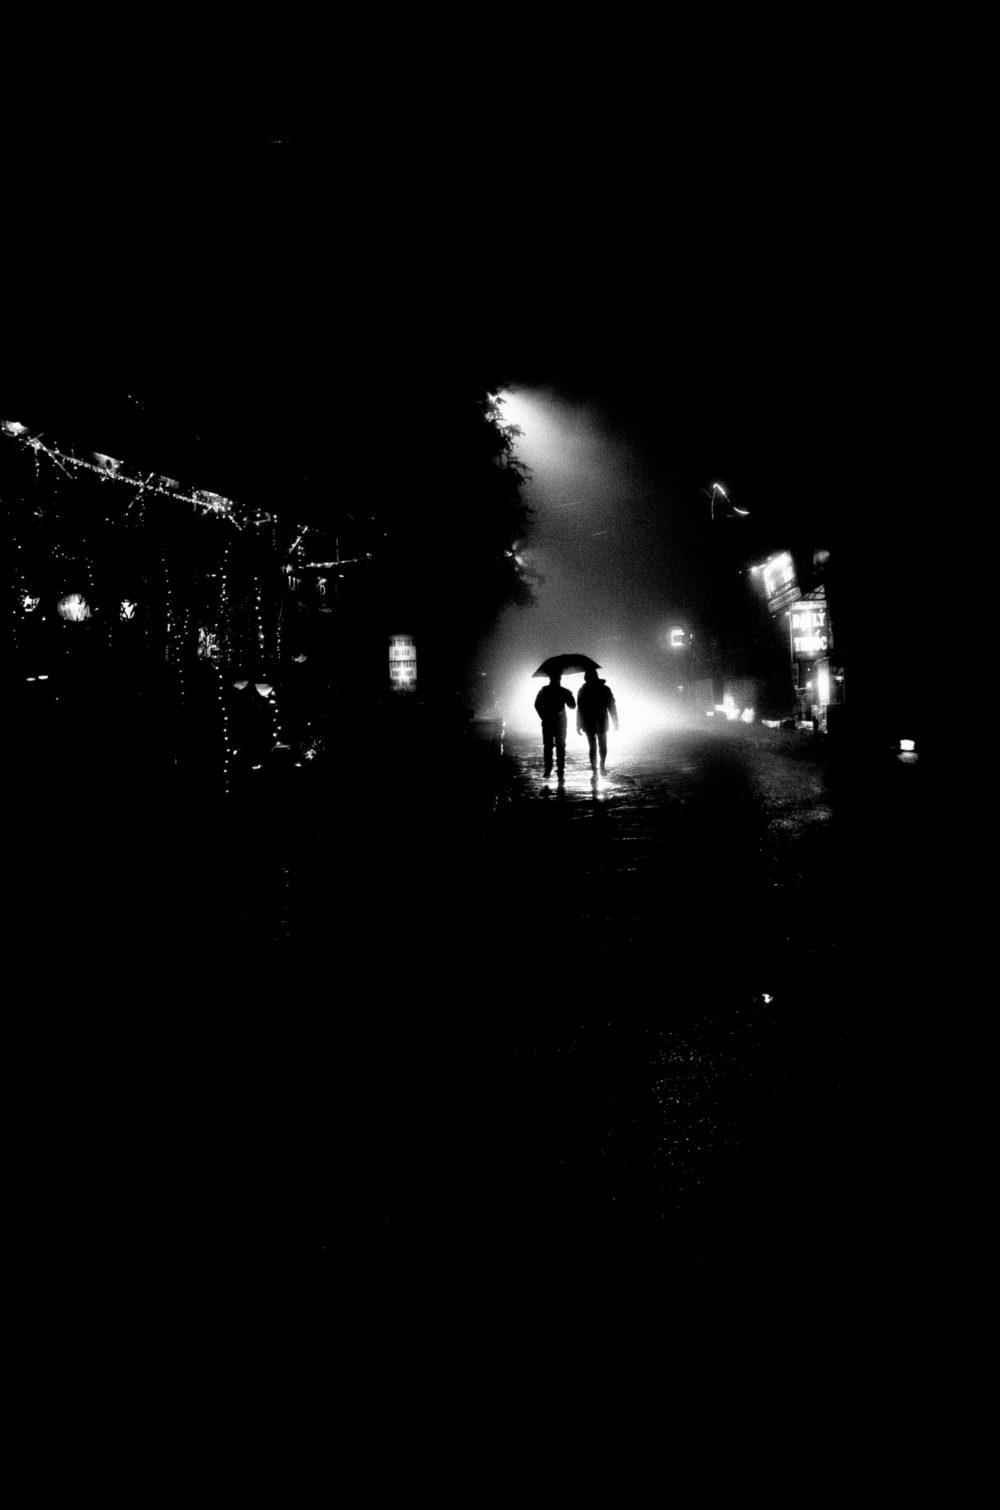 Black and white street photo